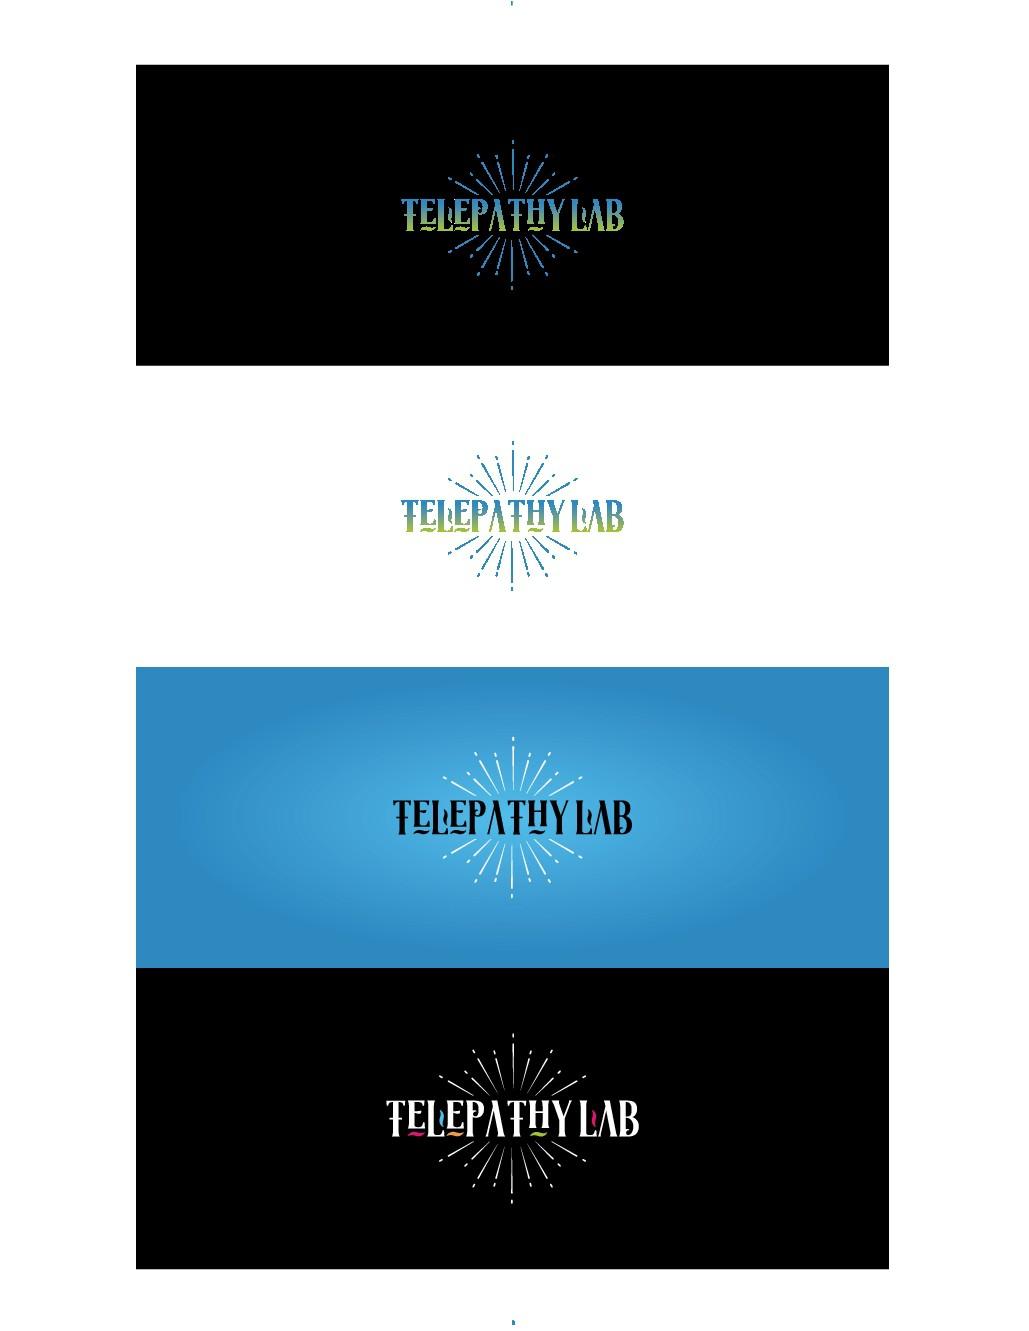 The Telepathy Lab